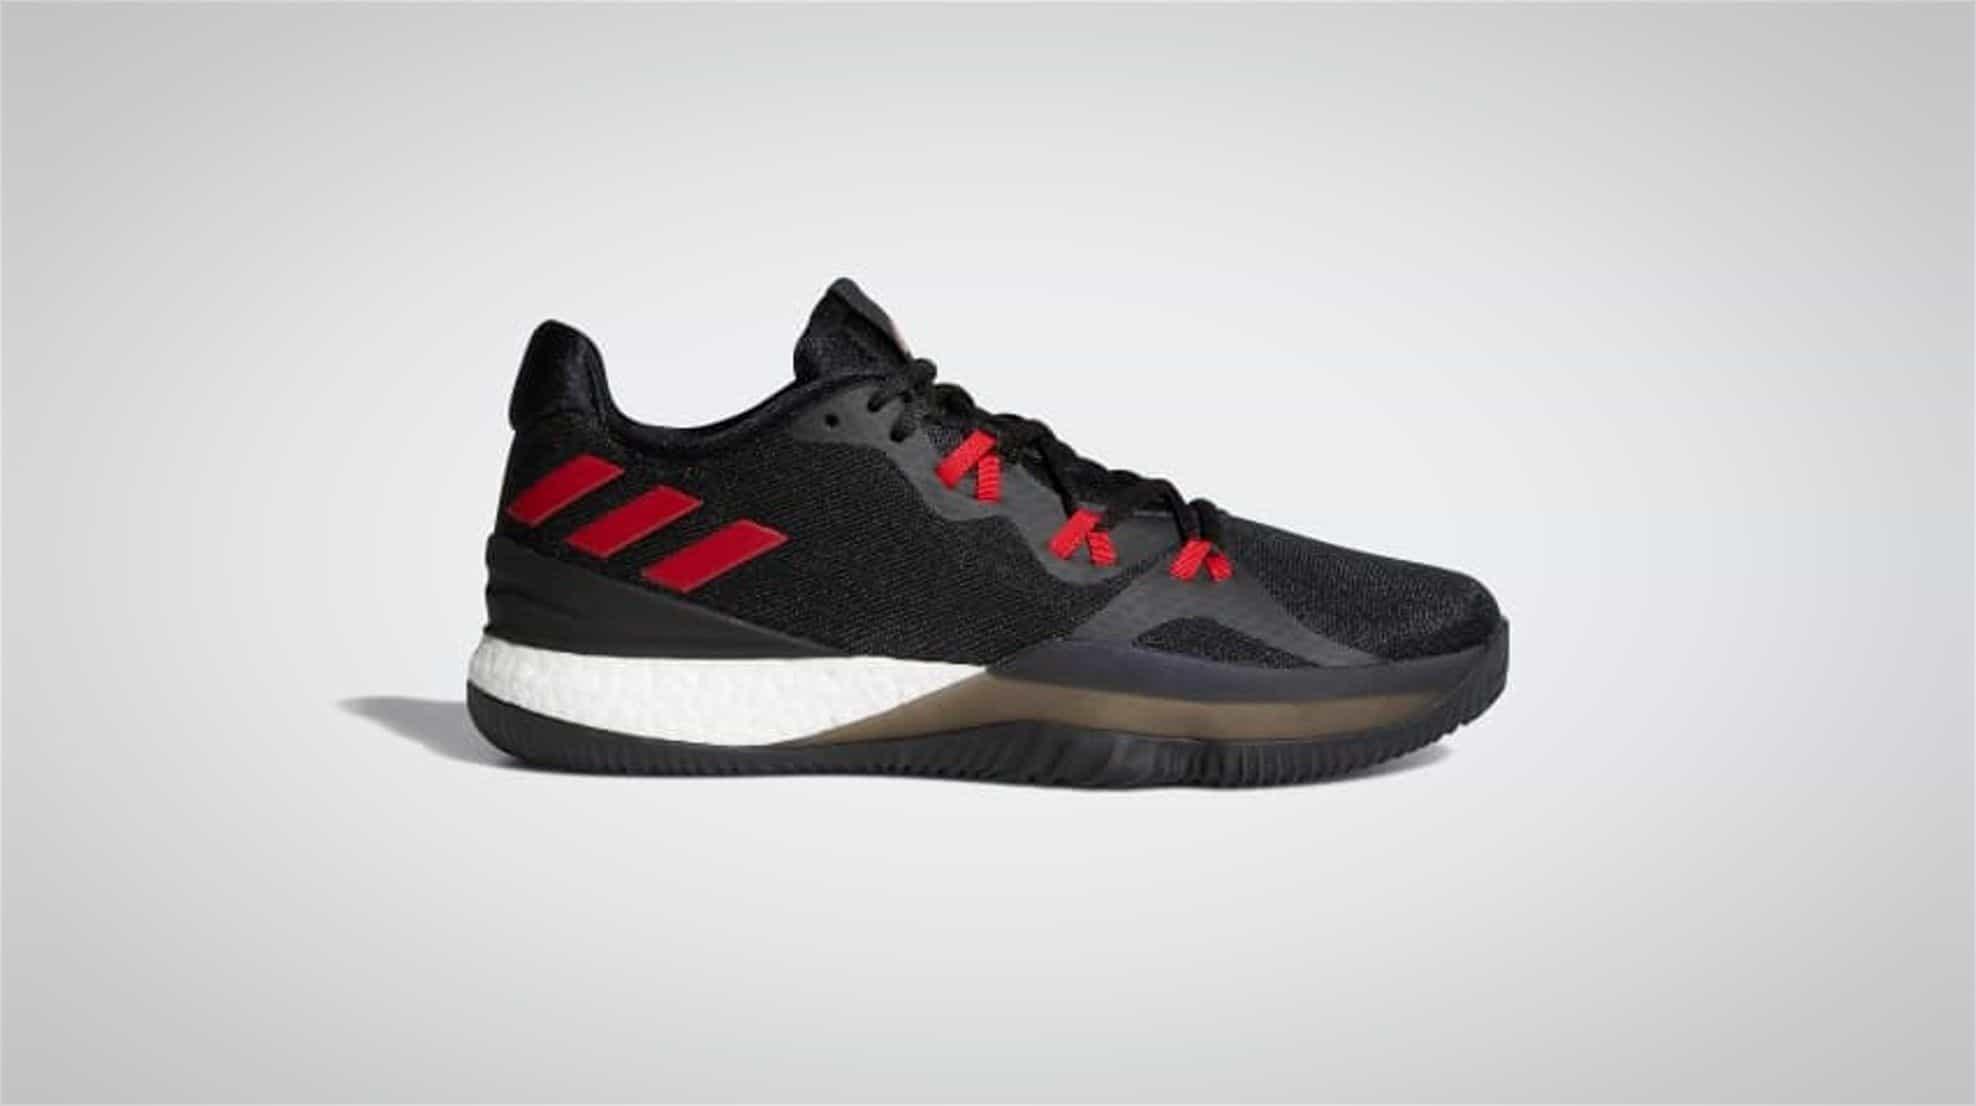 355c113115f8 Adidas Crazylight Boost 2018 Shoe Review - BestOutdoorBasketball